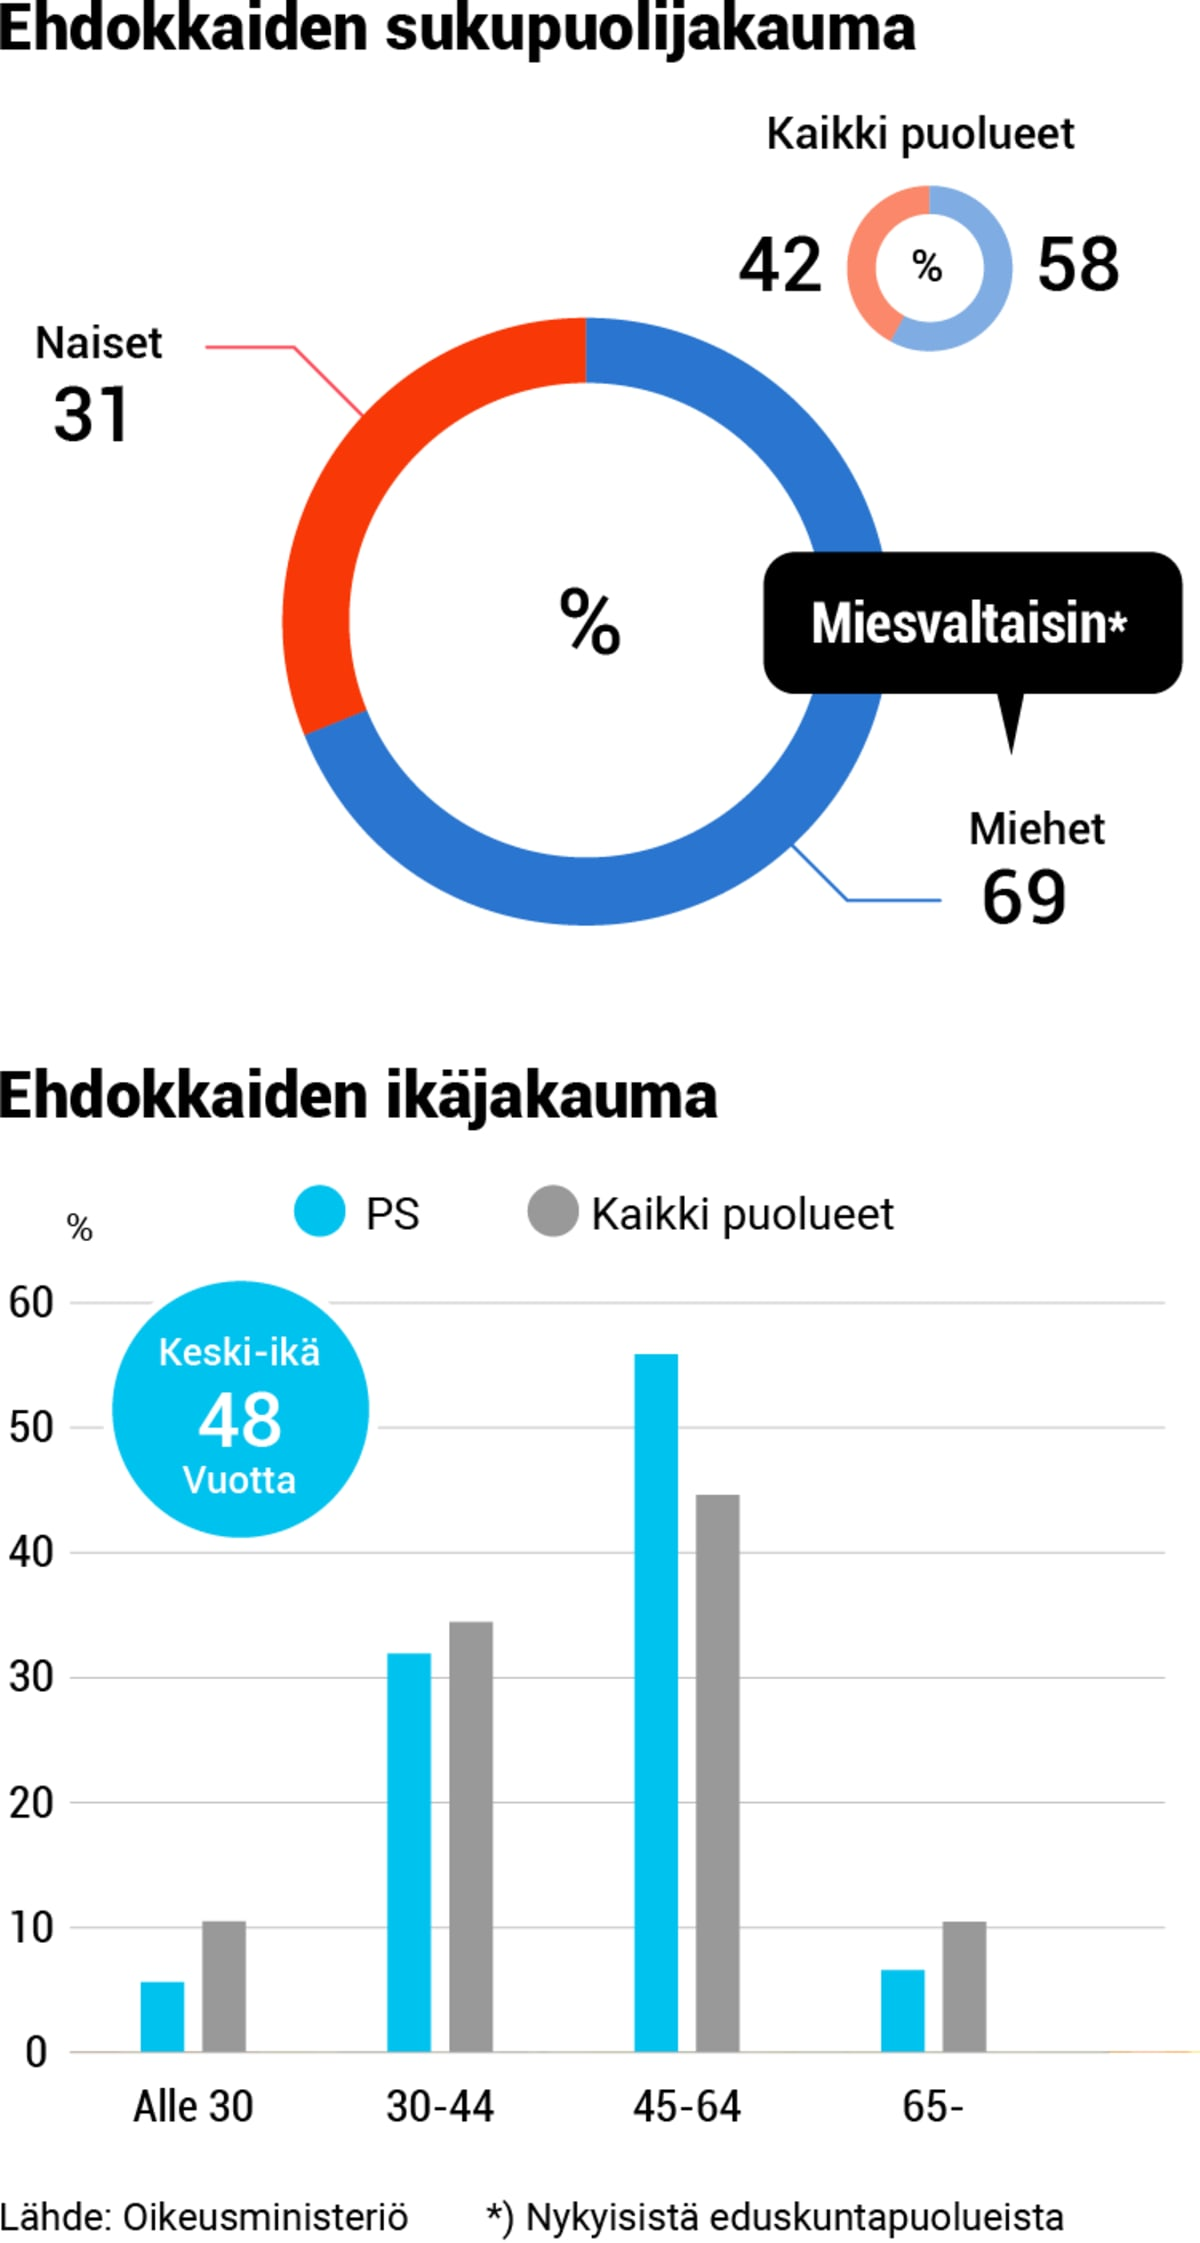 Puolueanalyysi, grafiikka, 08-PS-demografia.png